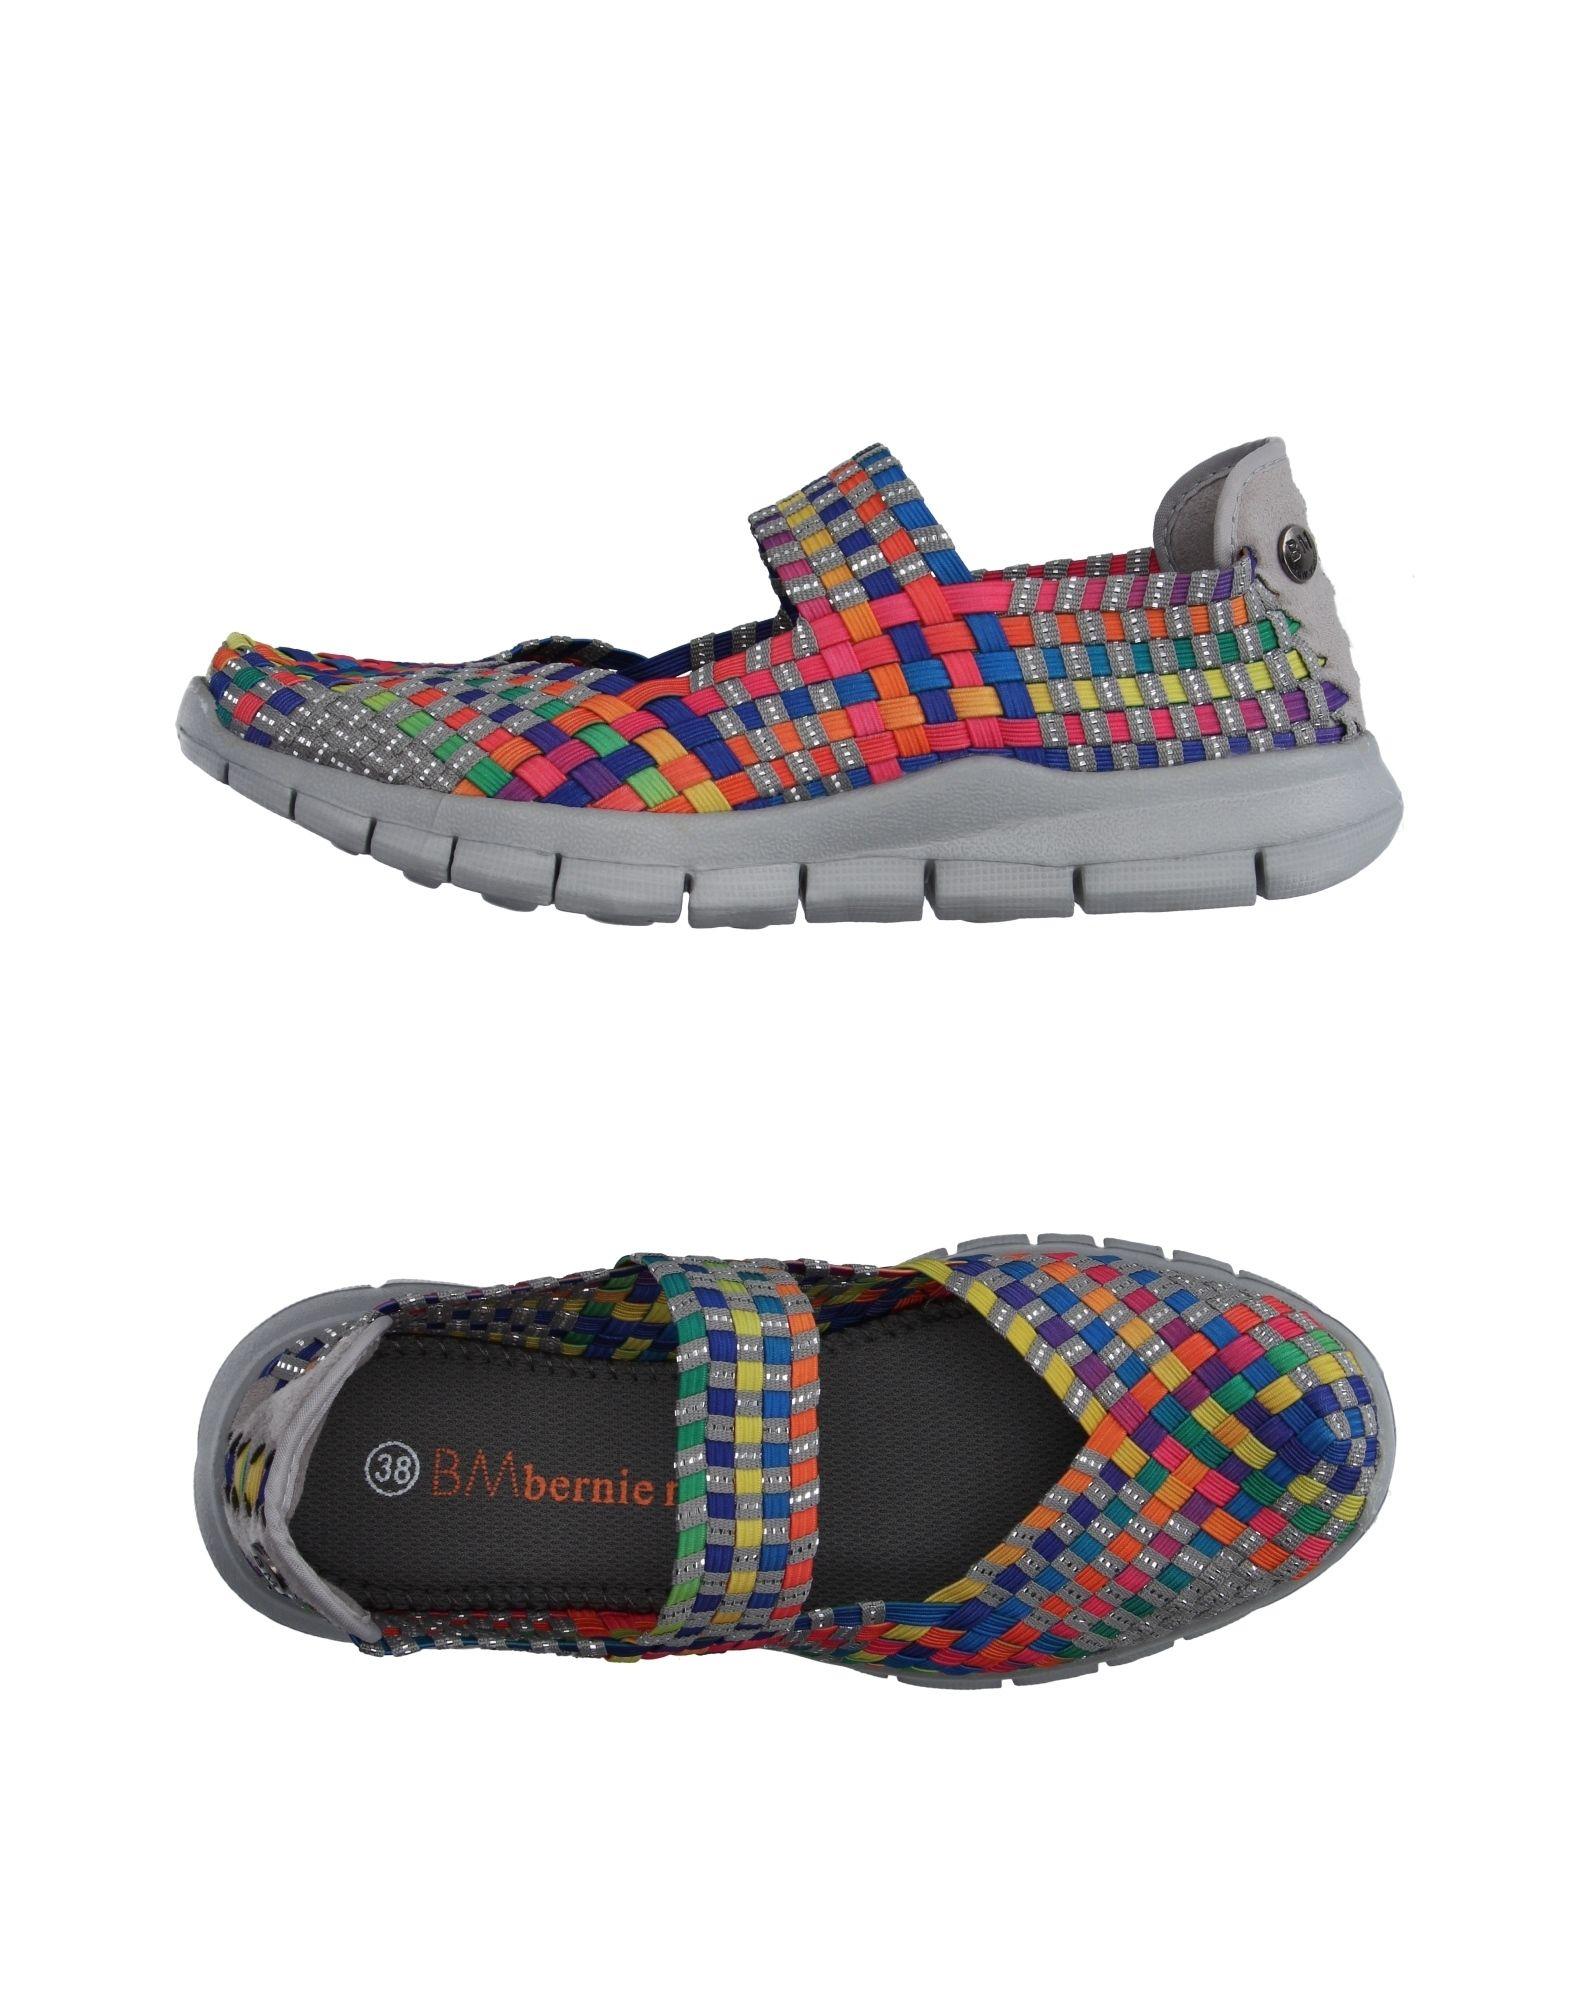 windsor smith female windsor smith sneakers